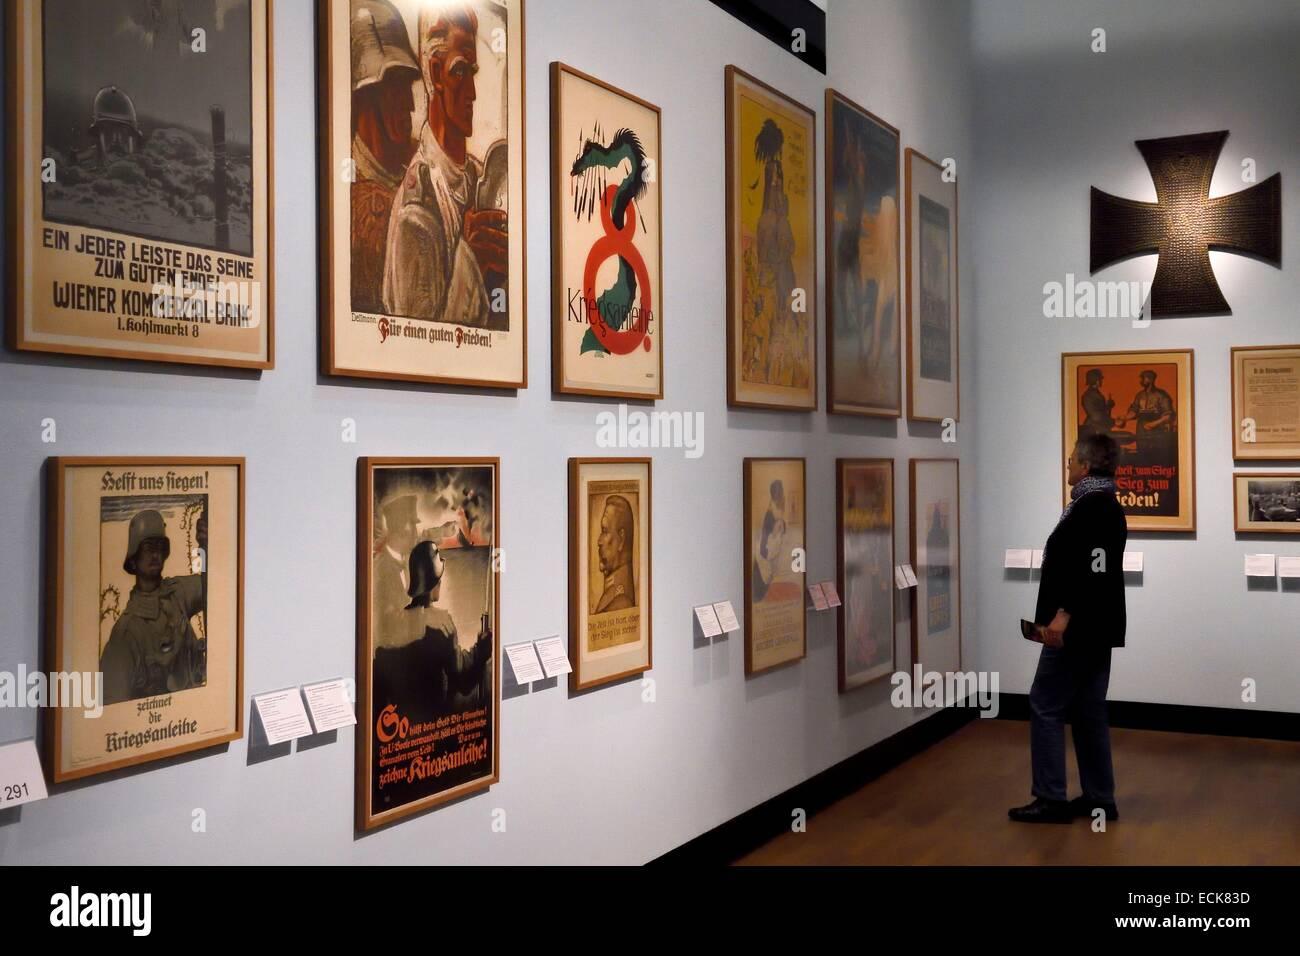 Germany, Berlin, the Deutsches Historisches Museum (German Historical Museum), the first world war - Stock Image